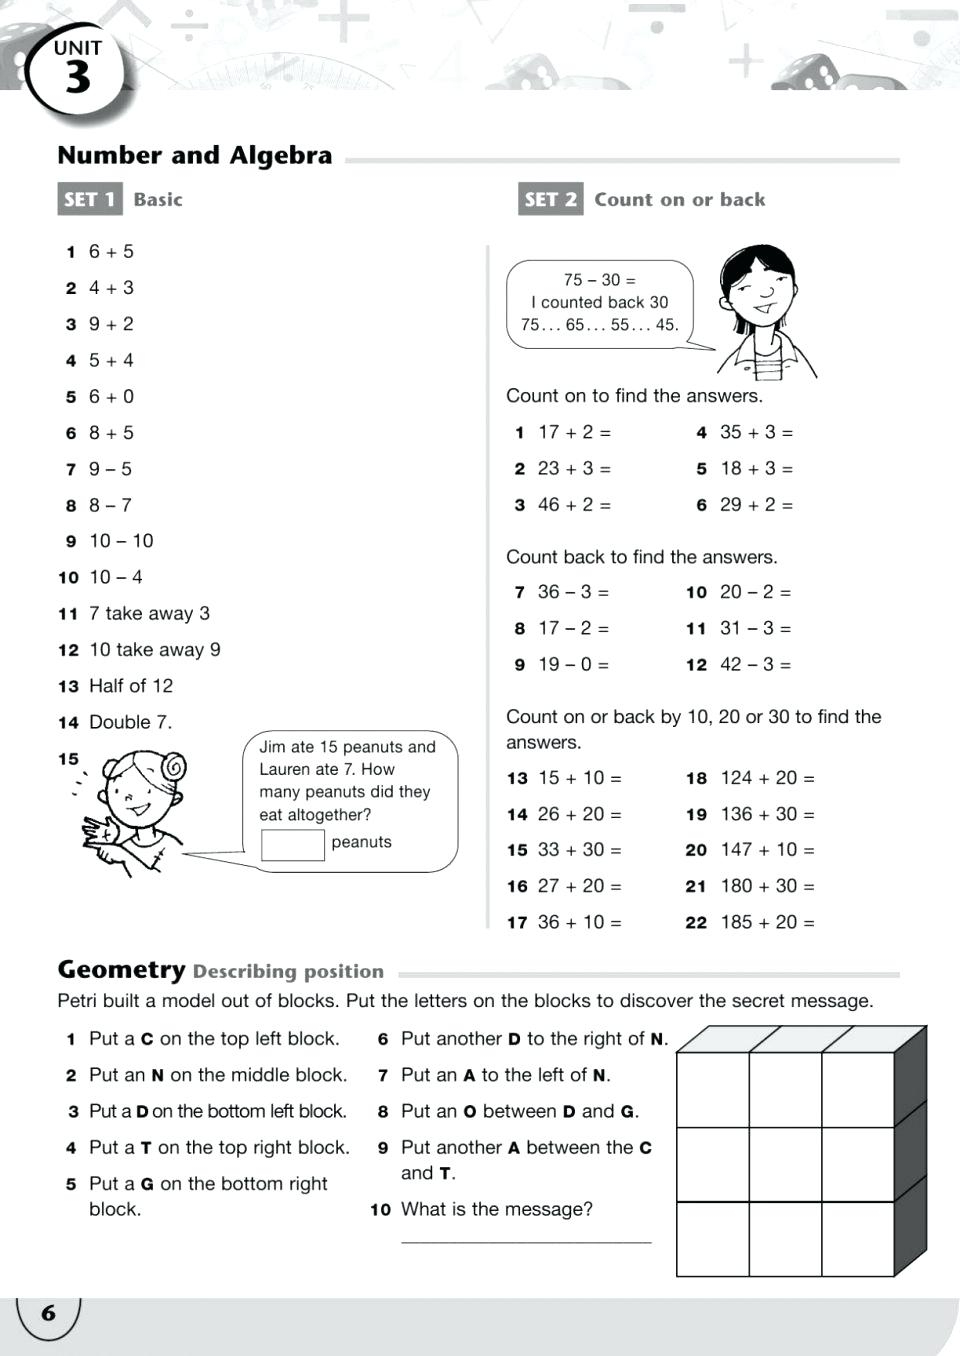 Worksheet : Printable Reading Comprehension Passages Grammar | Free Printable Grammar Worksheets For Highschool Students